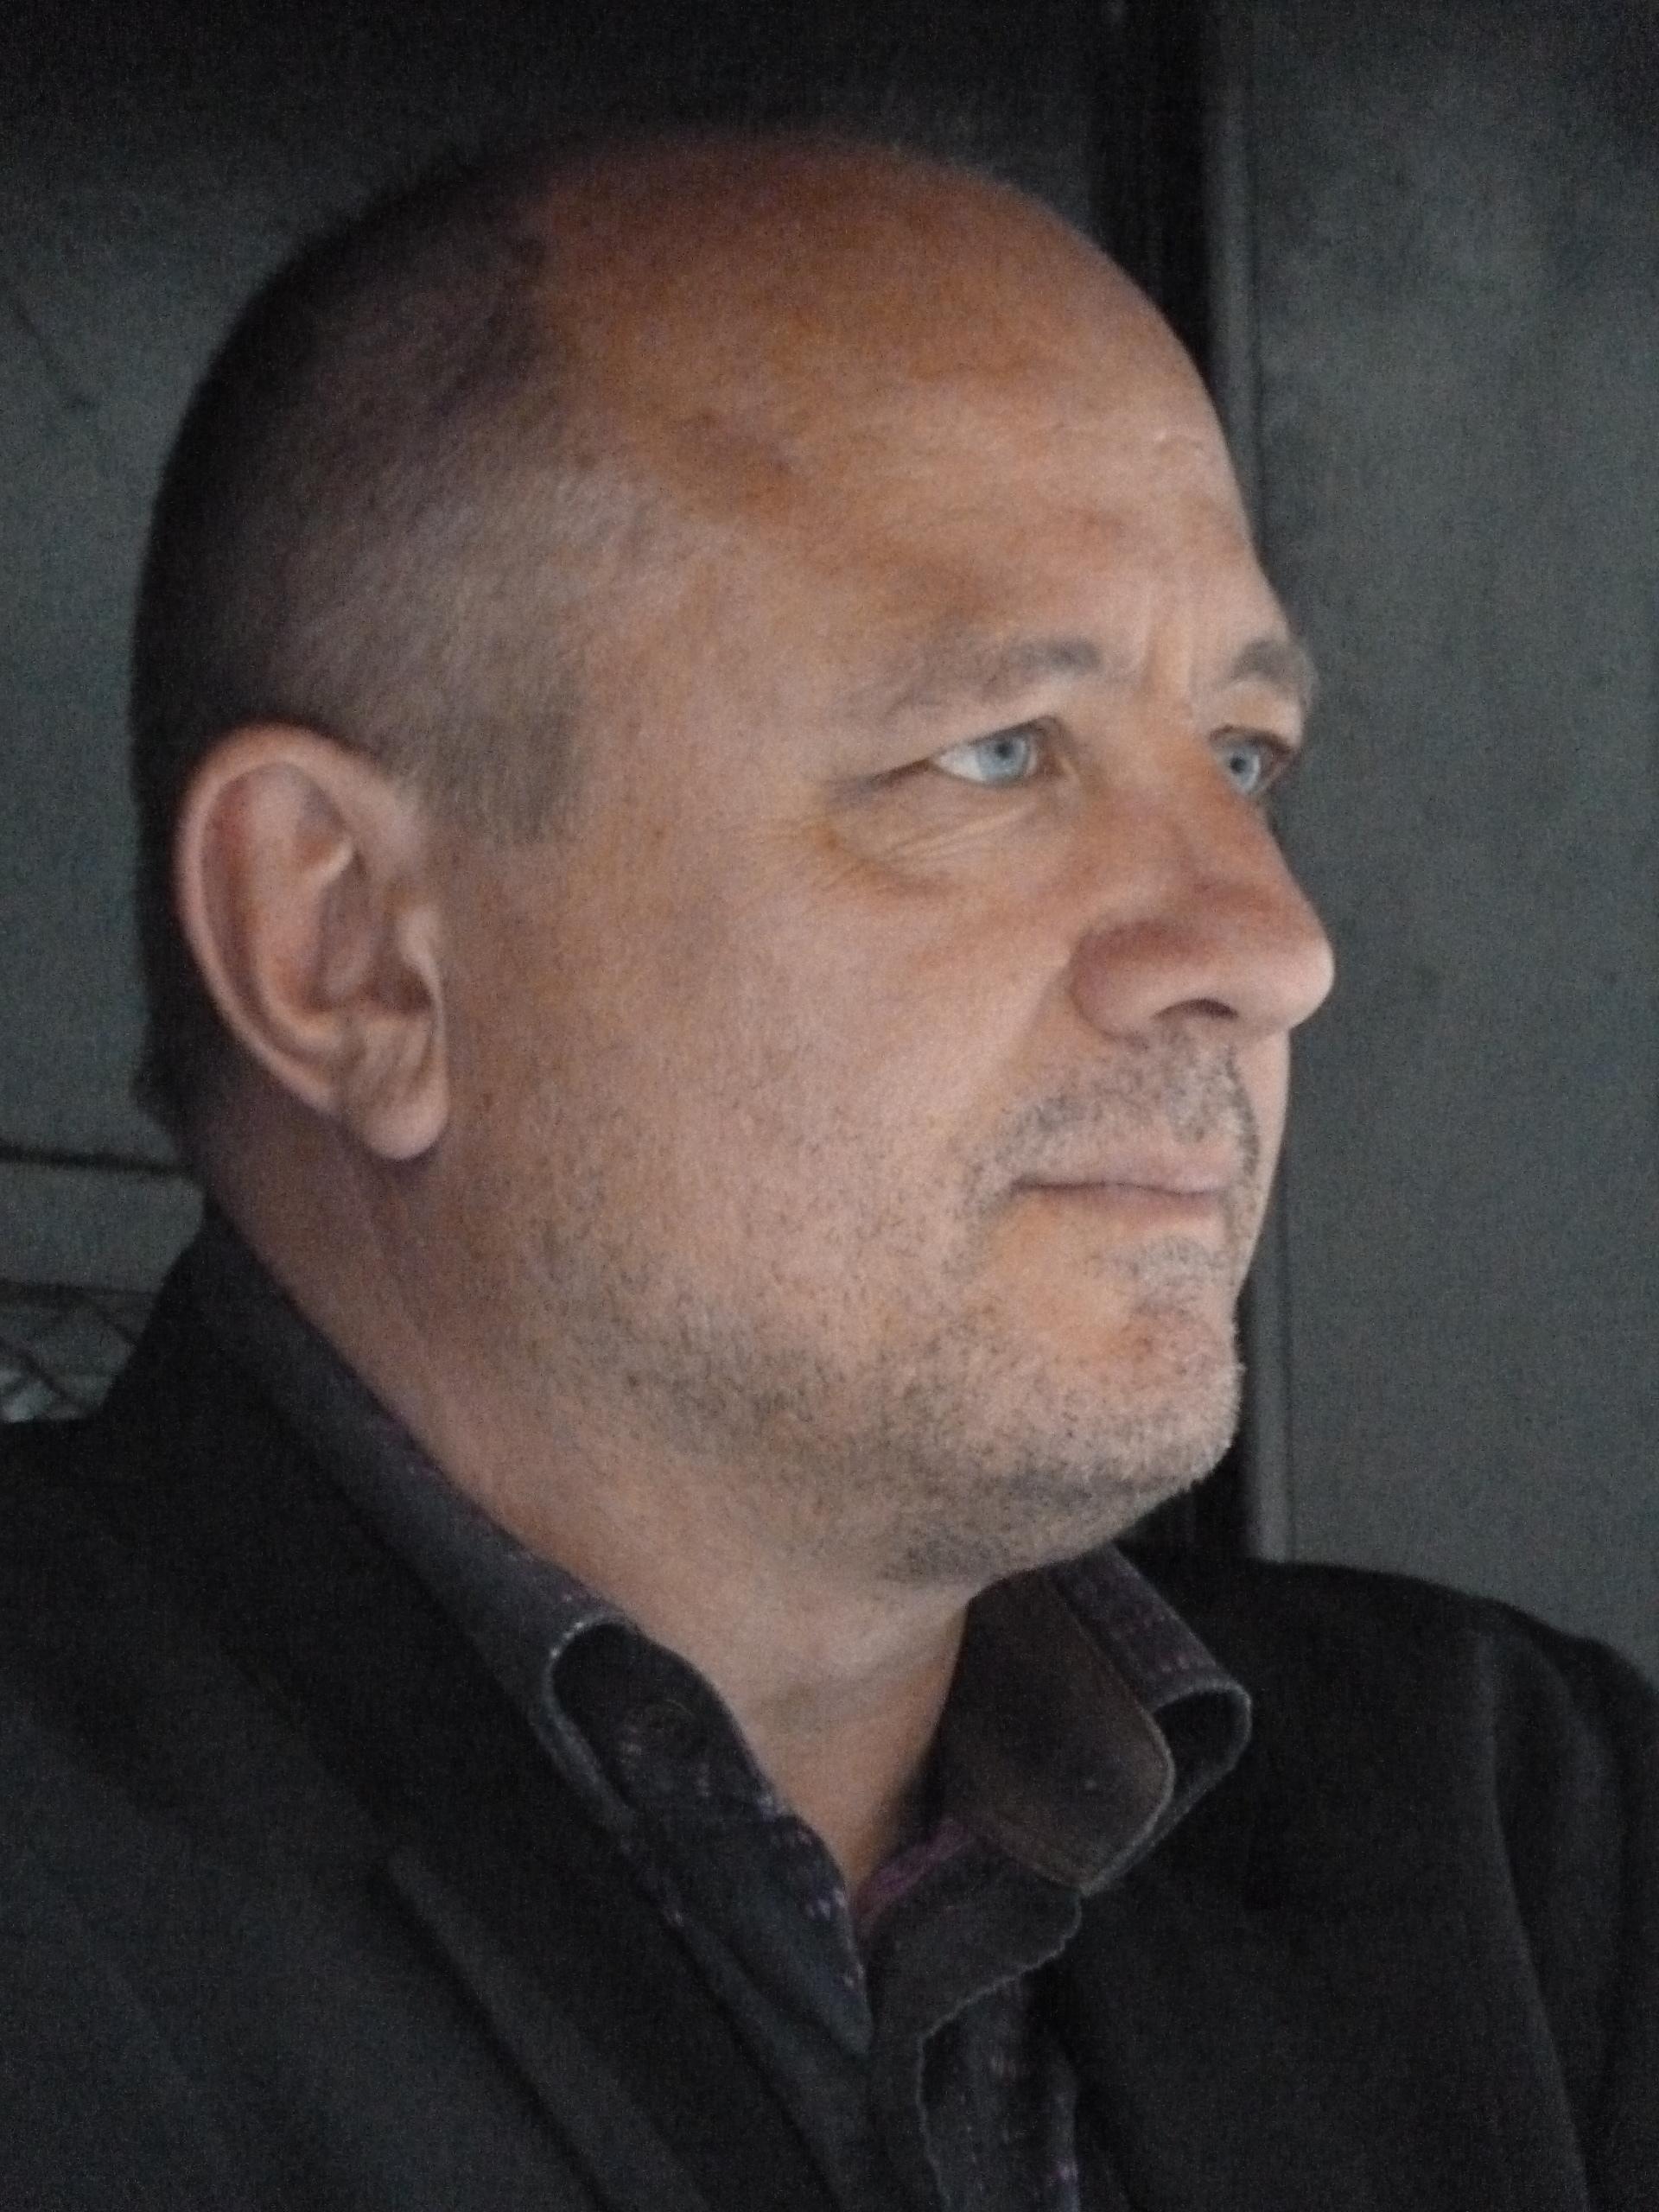 Carl Norac